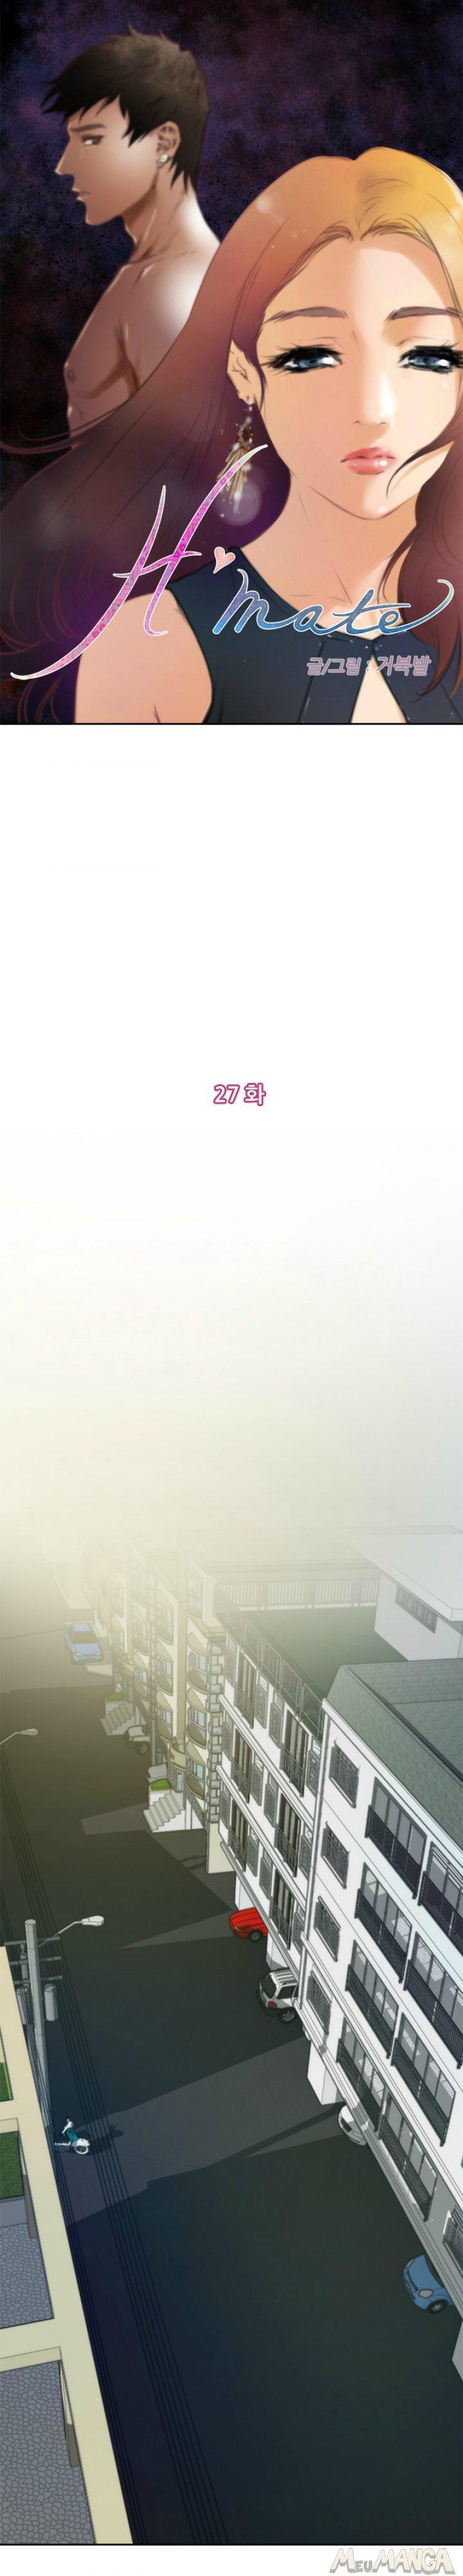 H MATE VOL. 03 CAP. 27